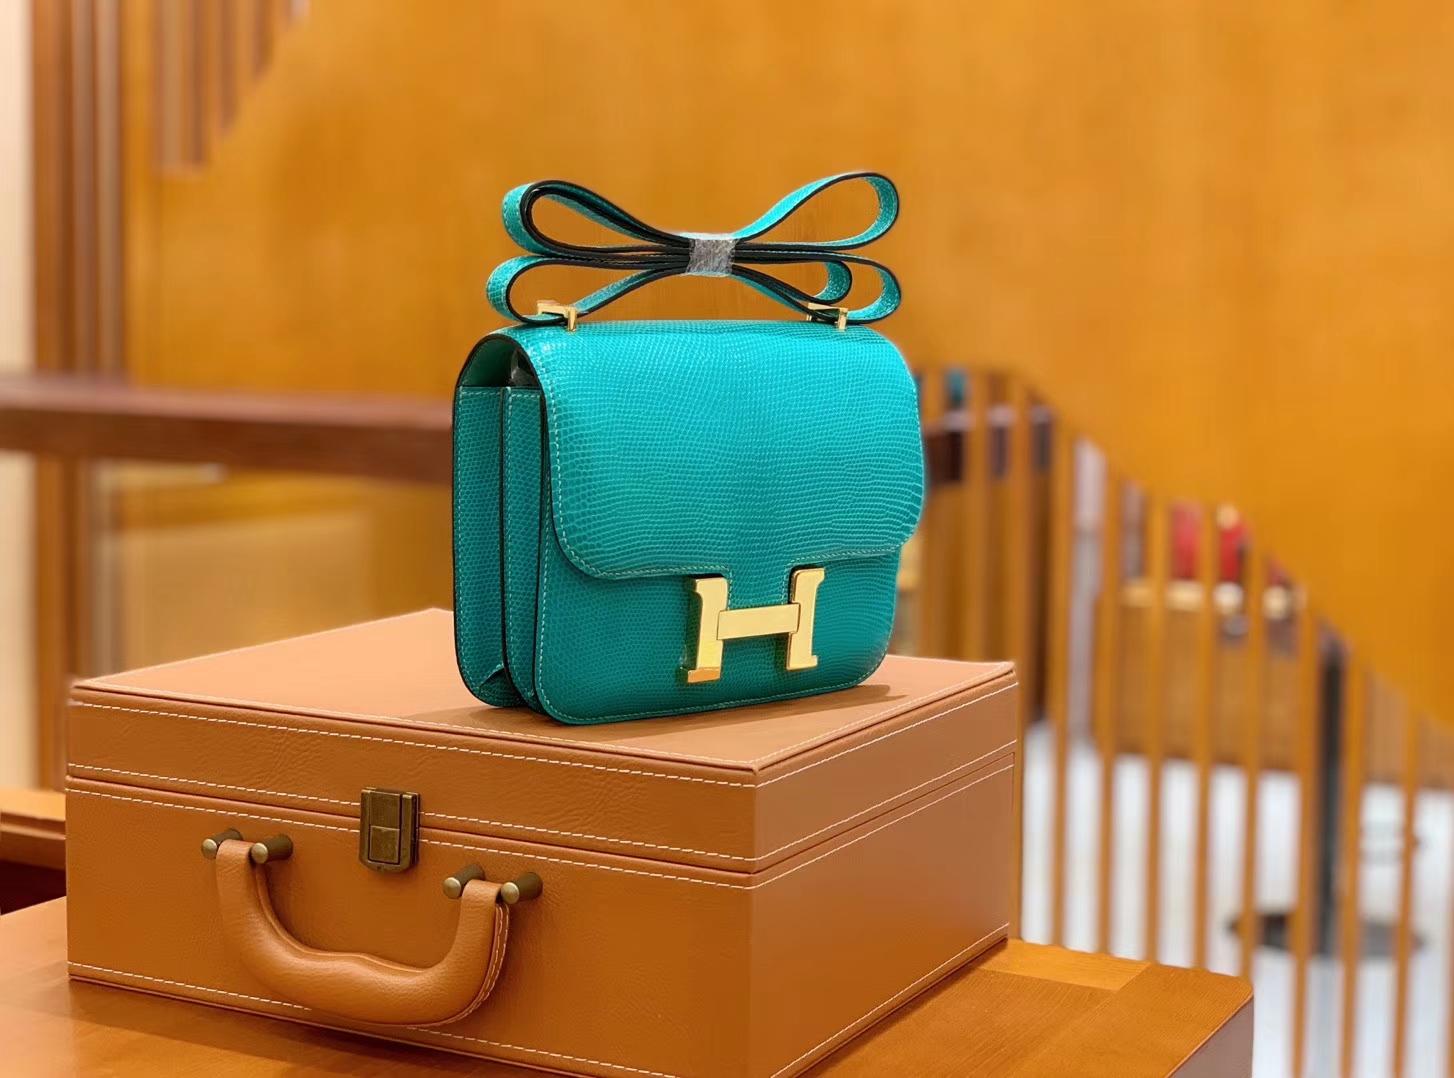 Hermès(爱马仕)Constance 空姐包 维罗纳绿 野生蜥蜴皮 全手工缝制 18cm 金扣 现货